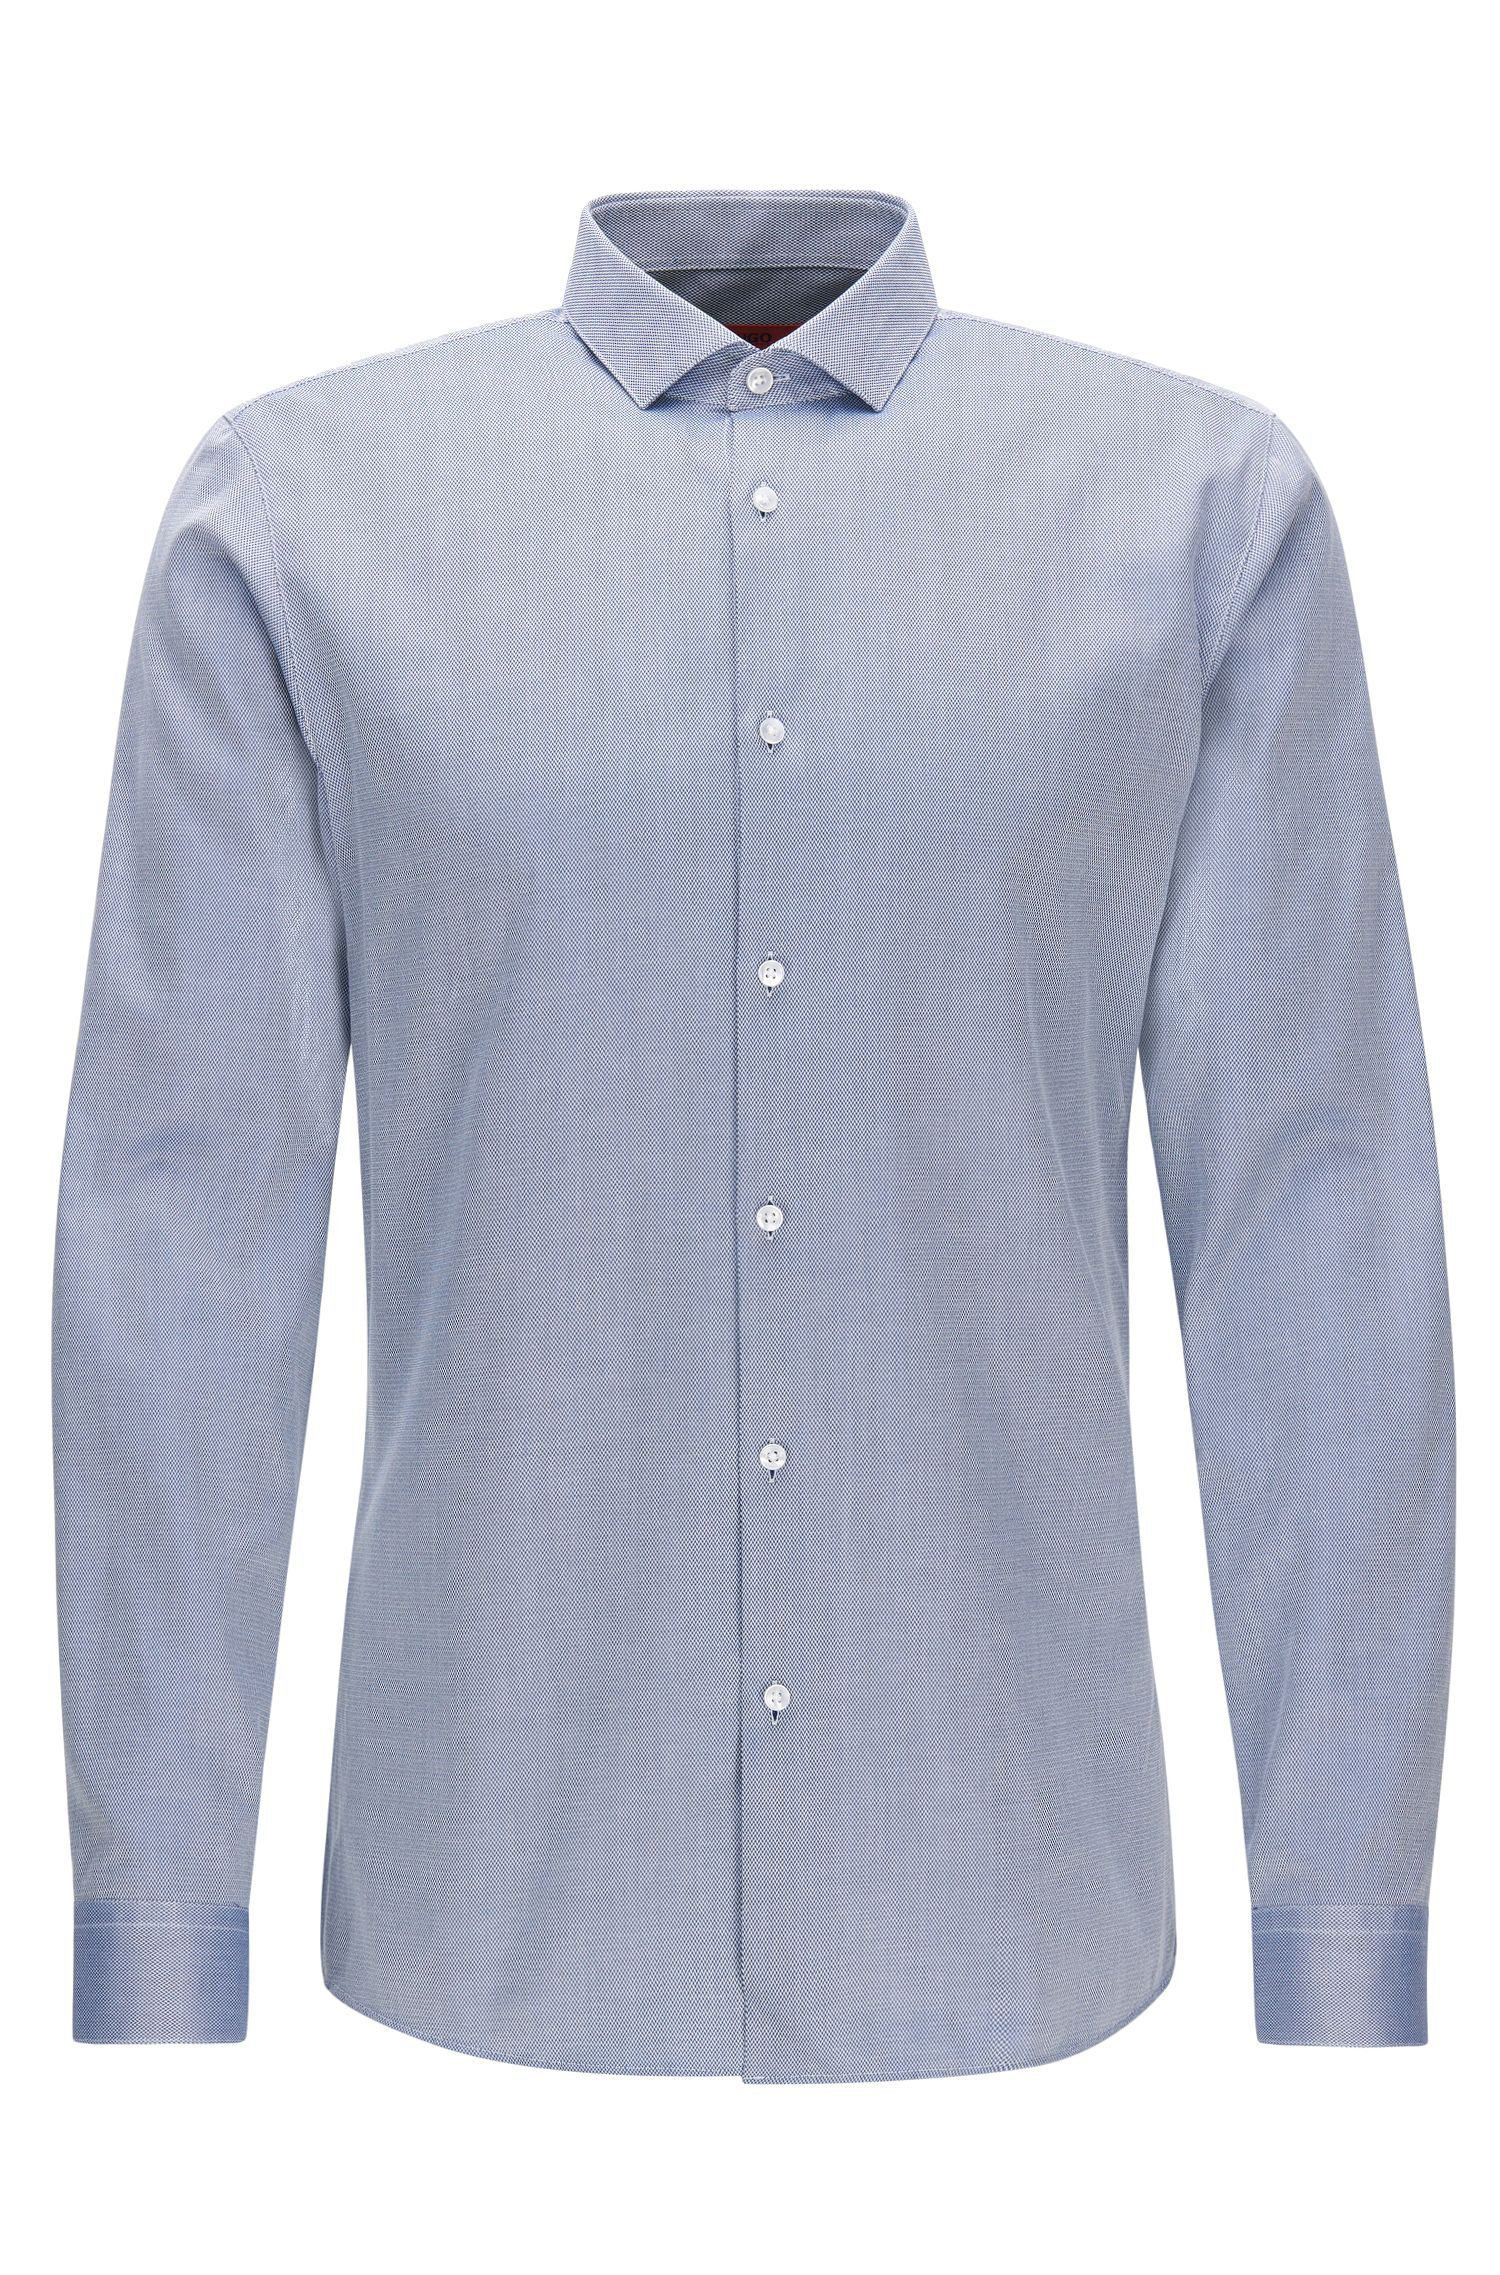 2-Ply Cotton Dress Shirt, Extra Slim Fit | Erondo